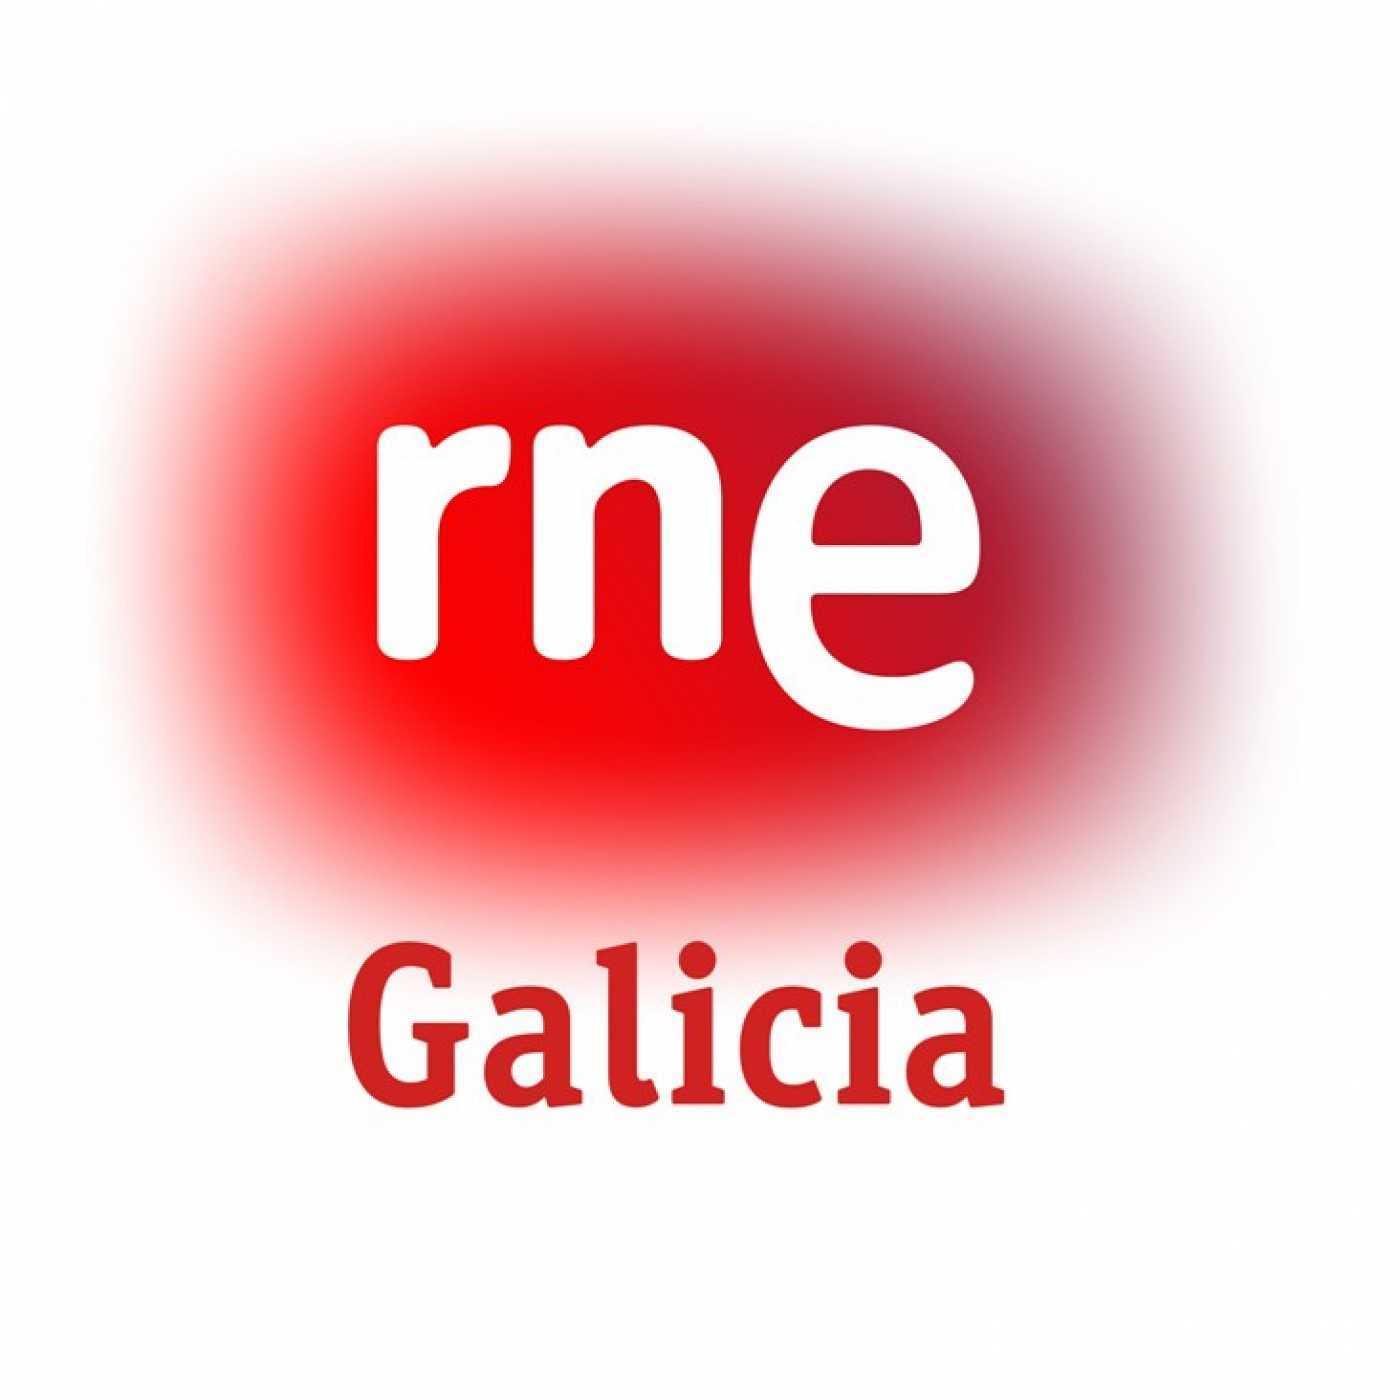 Informativo Galicia 7:45 - 30/10/20 - Escuchar ahora